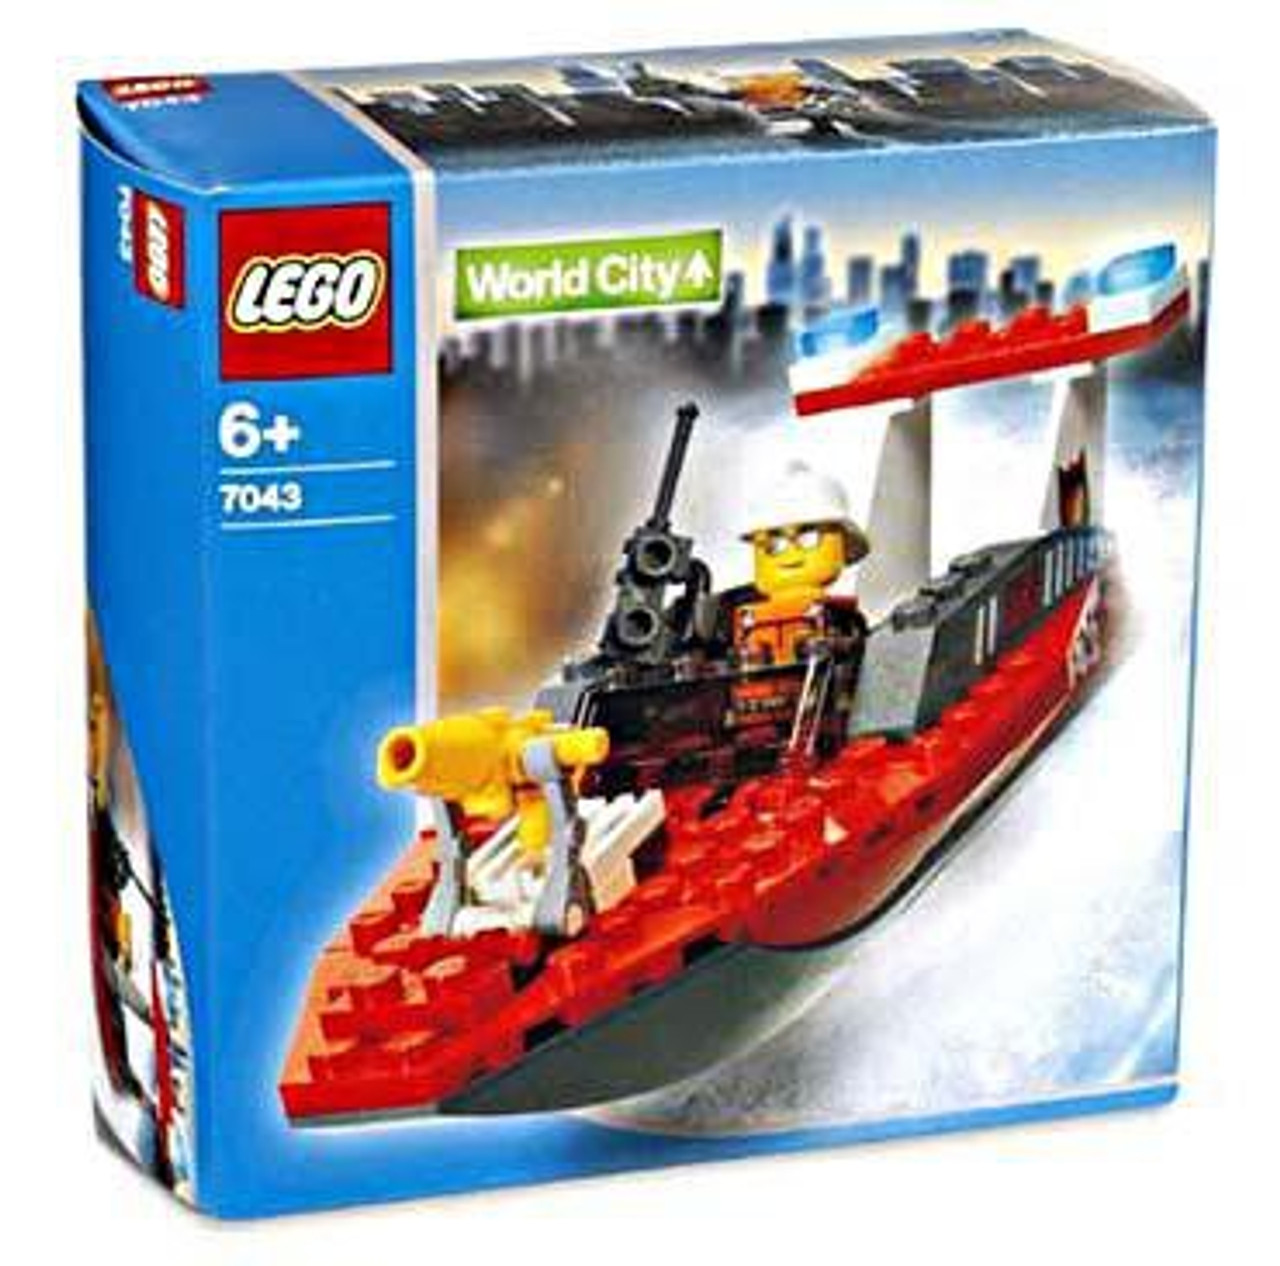 LEGO World City Firefighter Set #7043